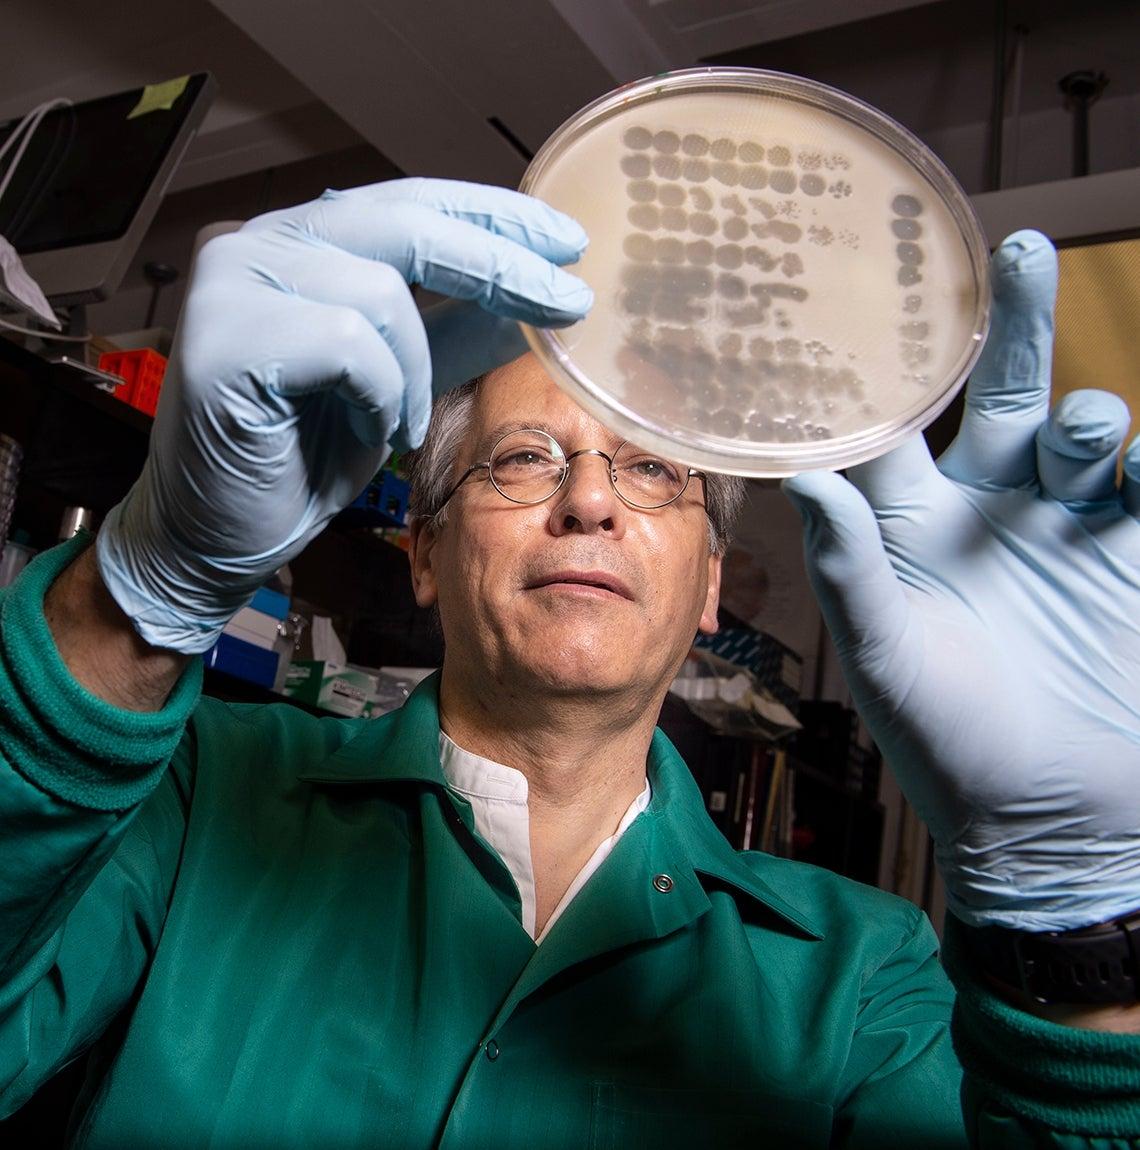 Graham Hatfull looks at a petri dish